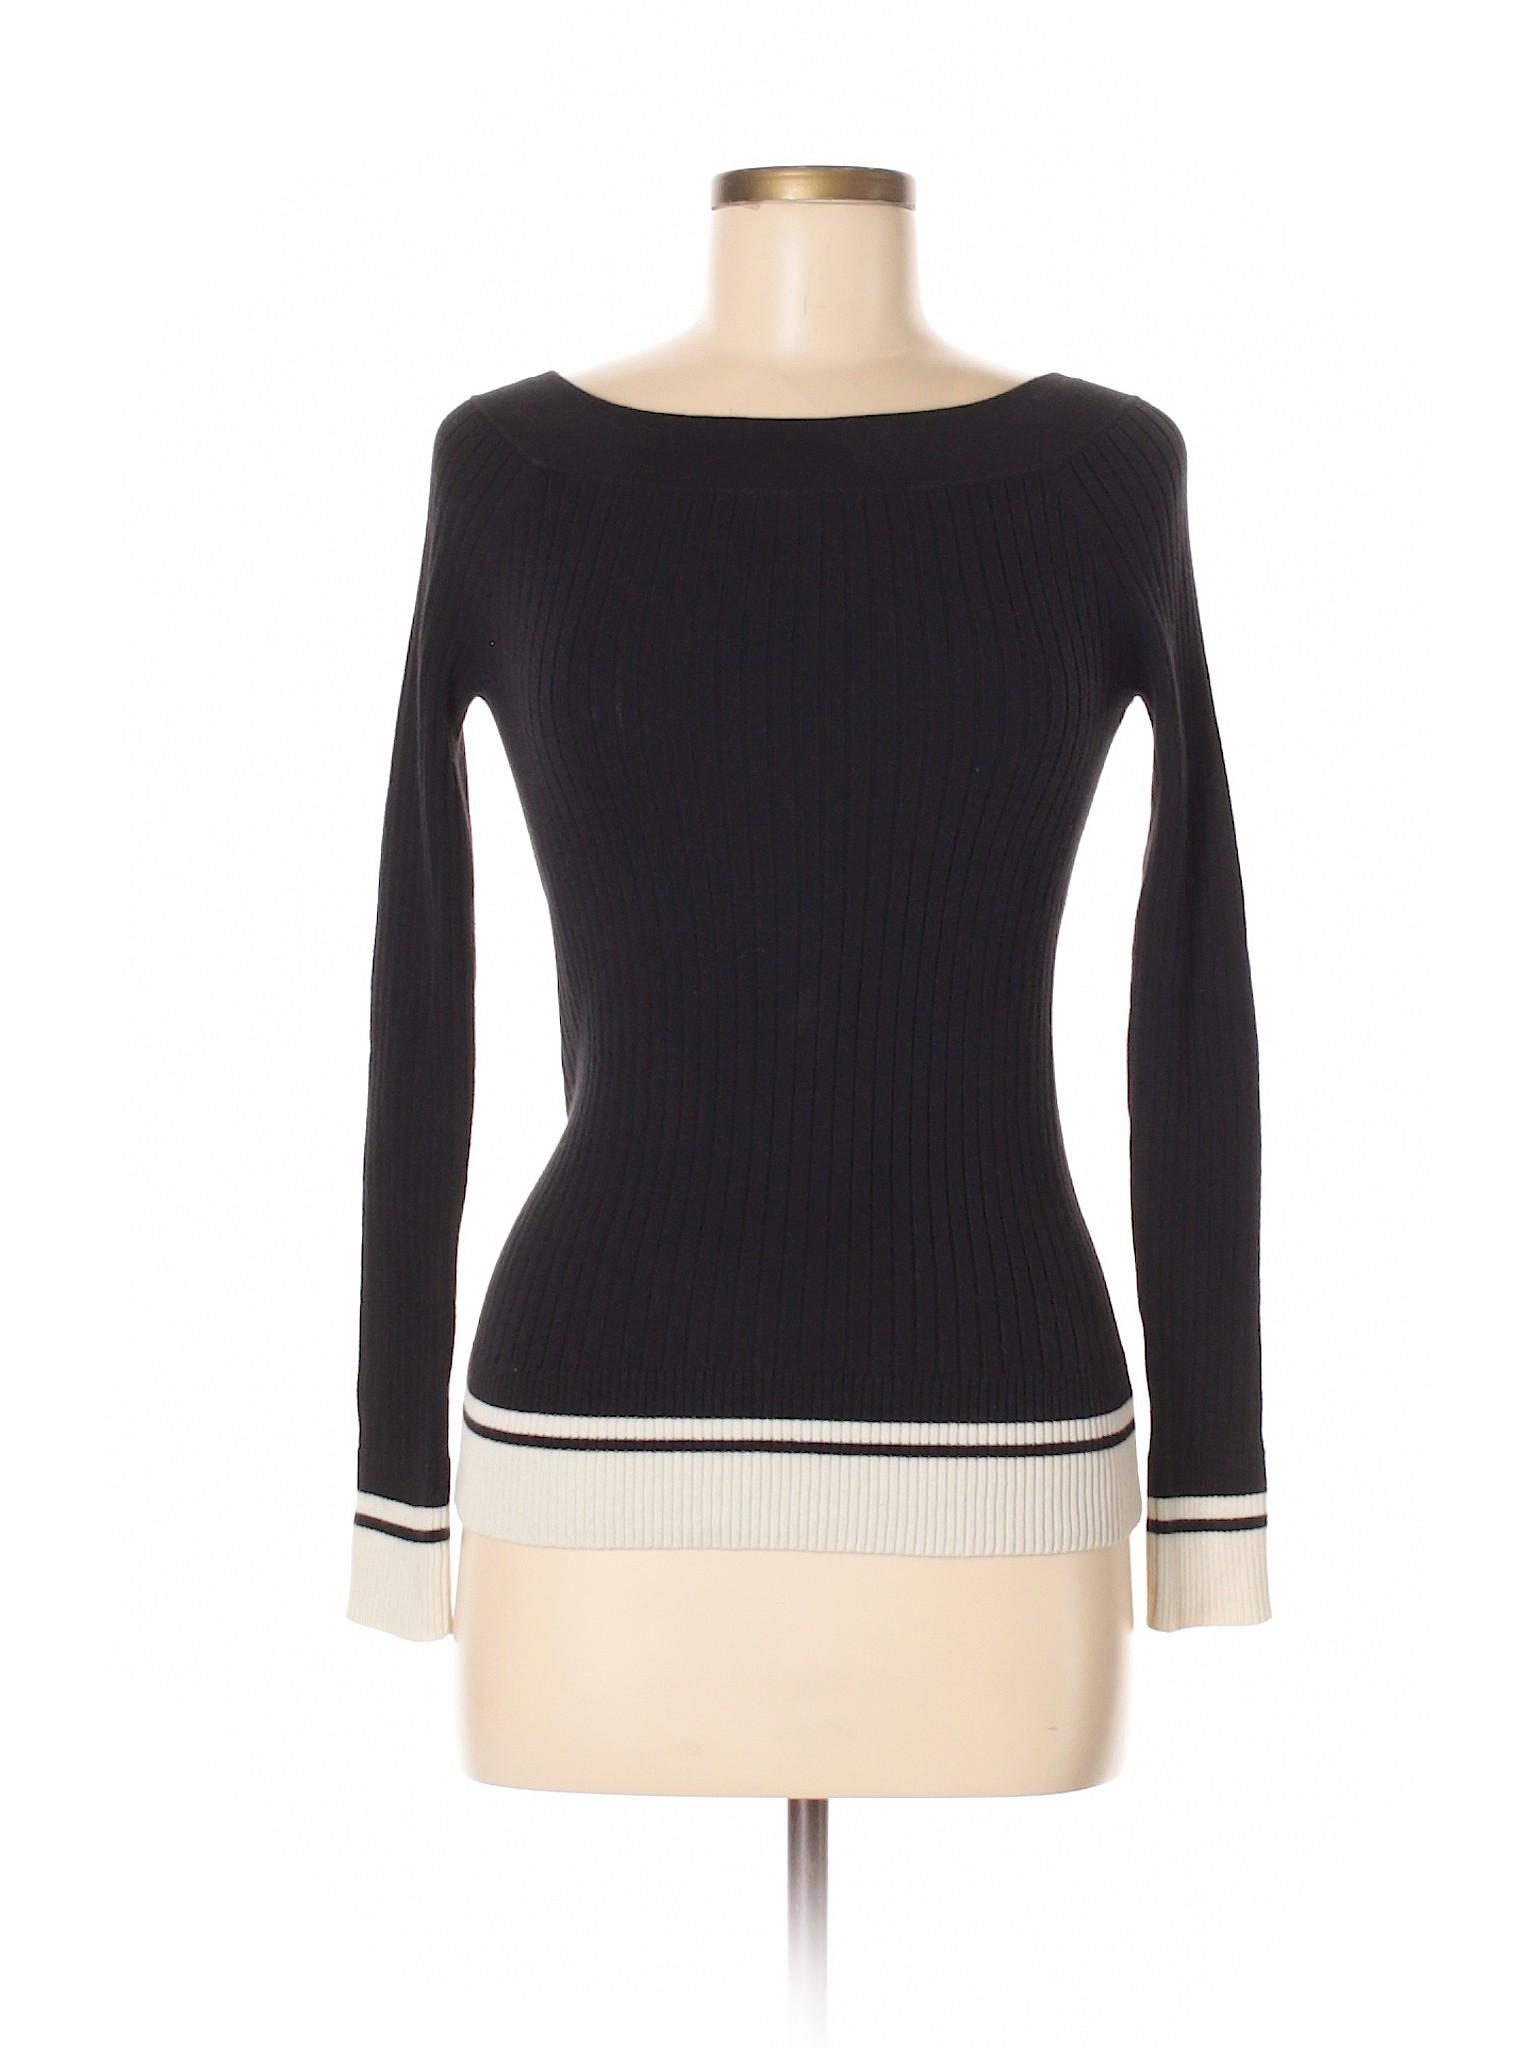 Sweater winter Pullover Boutique International Moda IRgzxn8